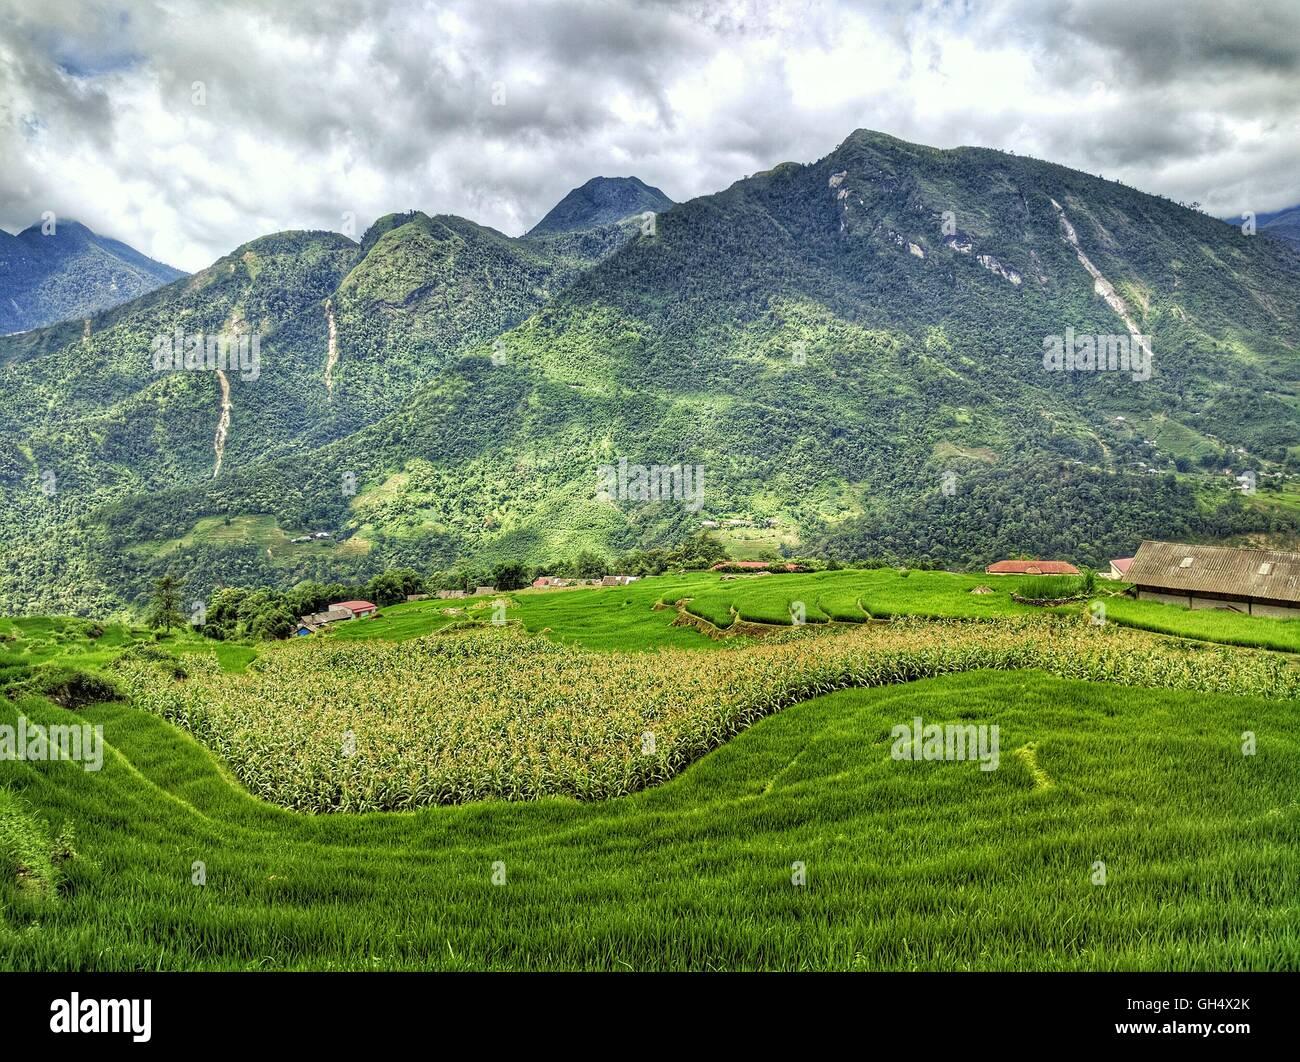 Mountains at Sapa - Stock Image